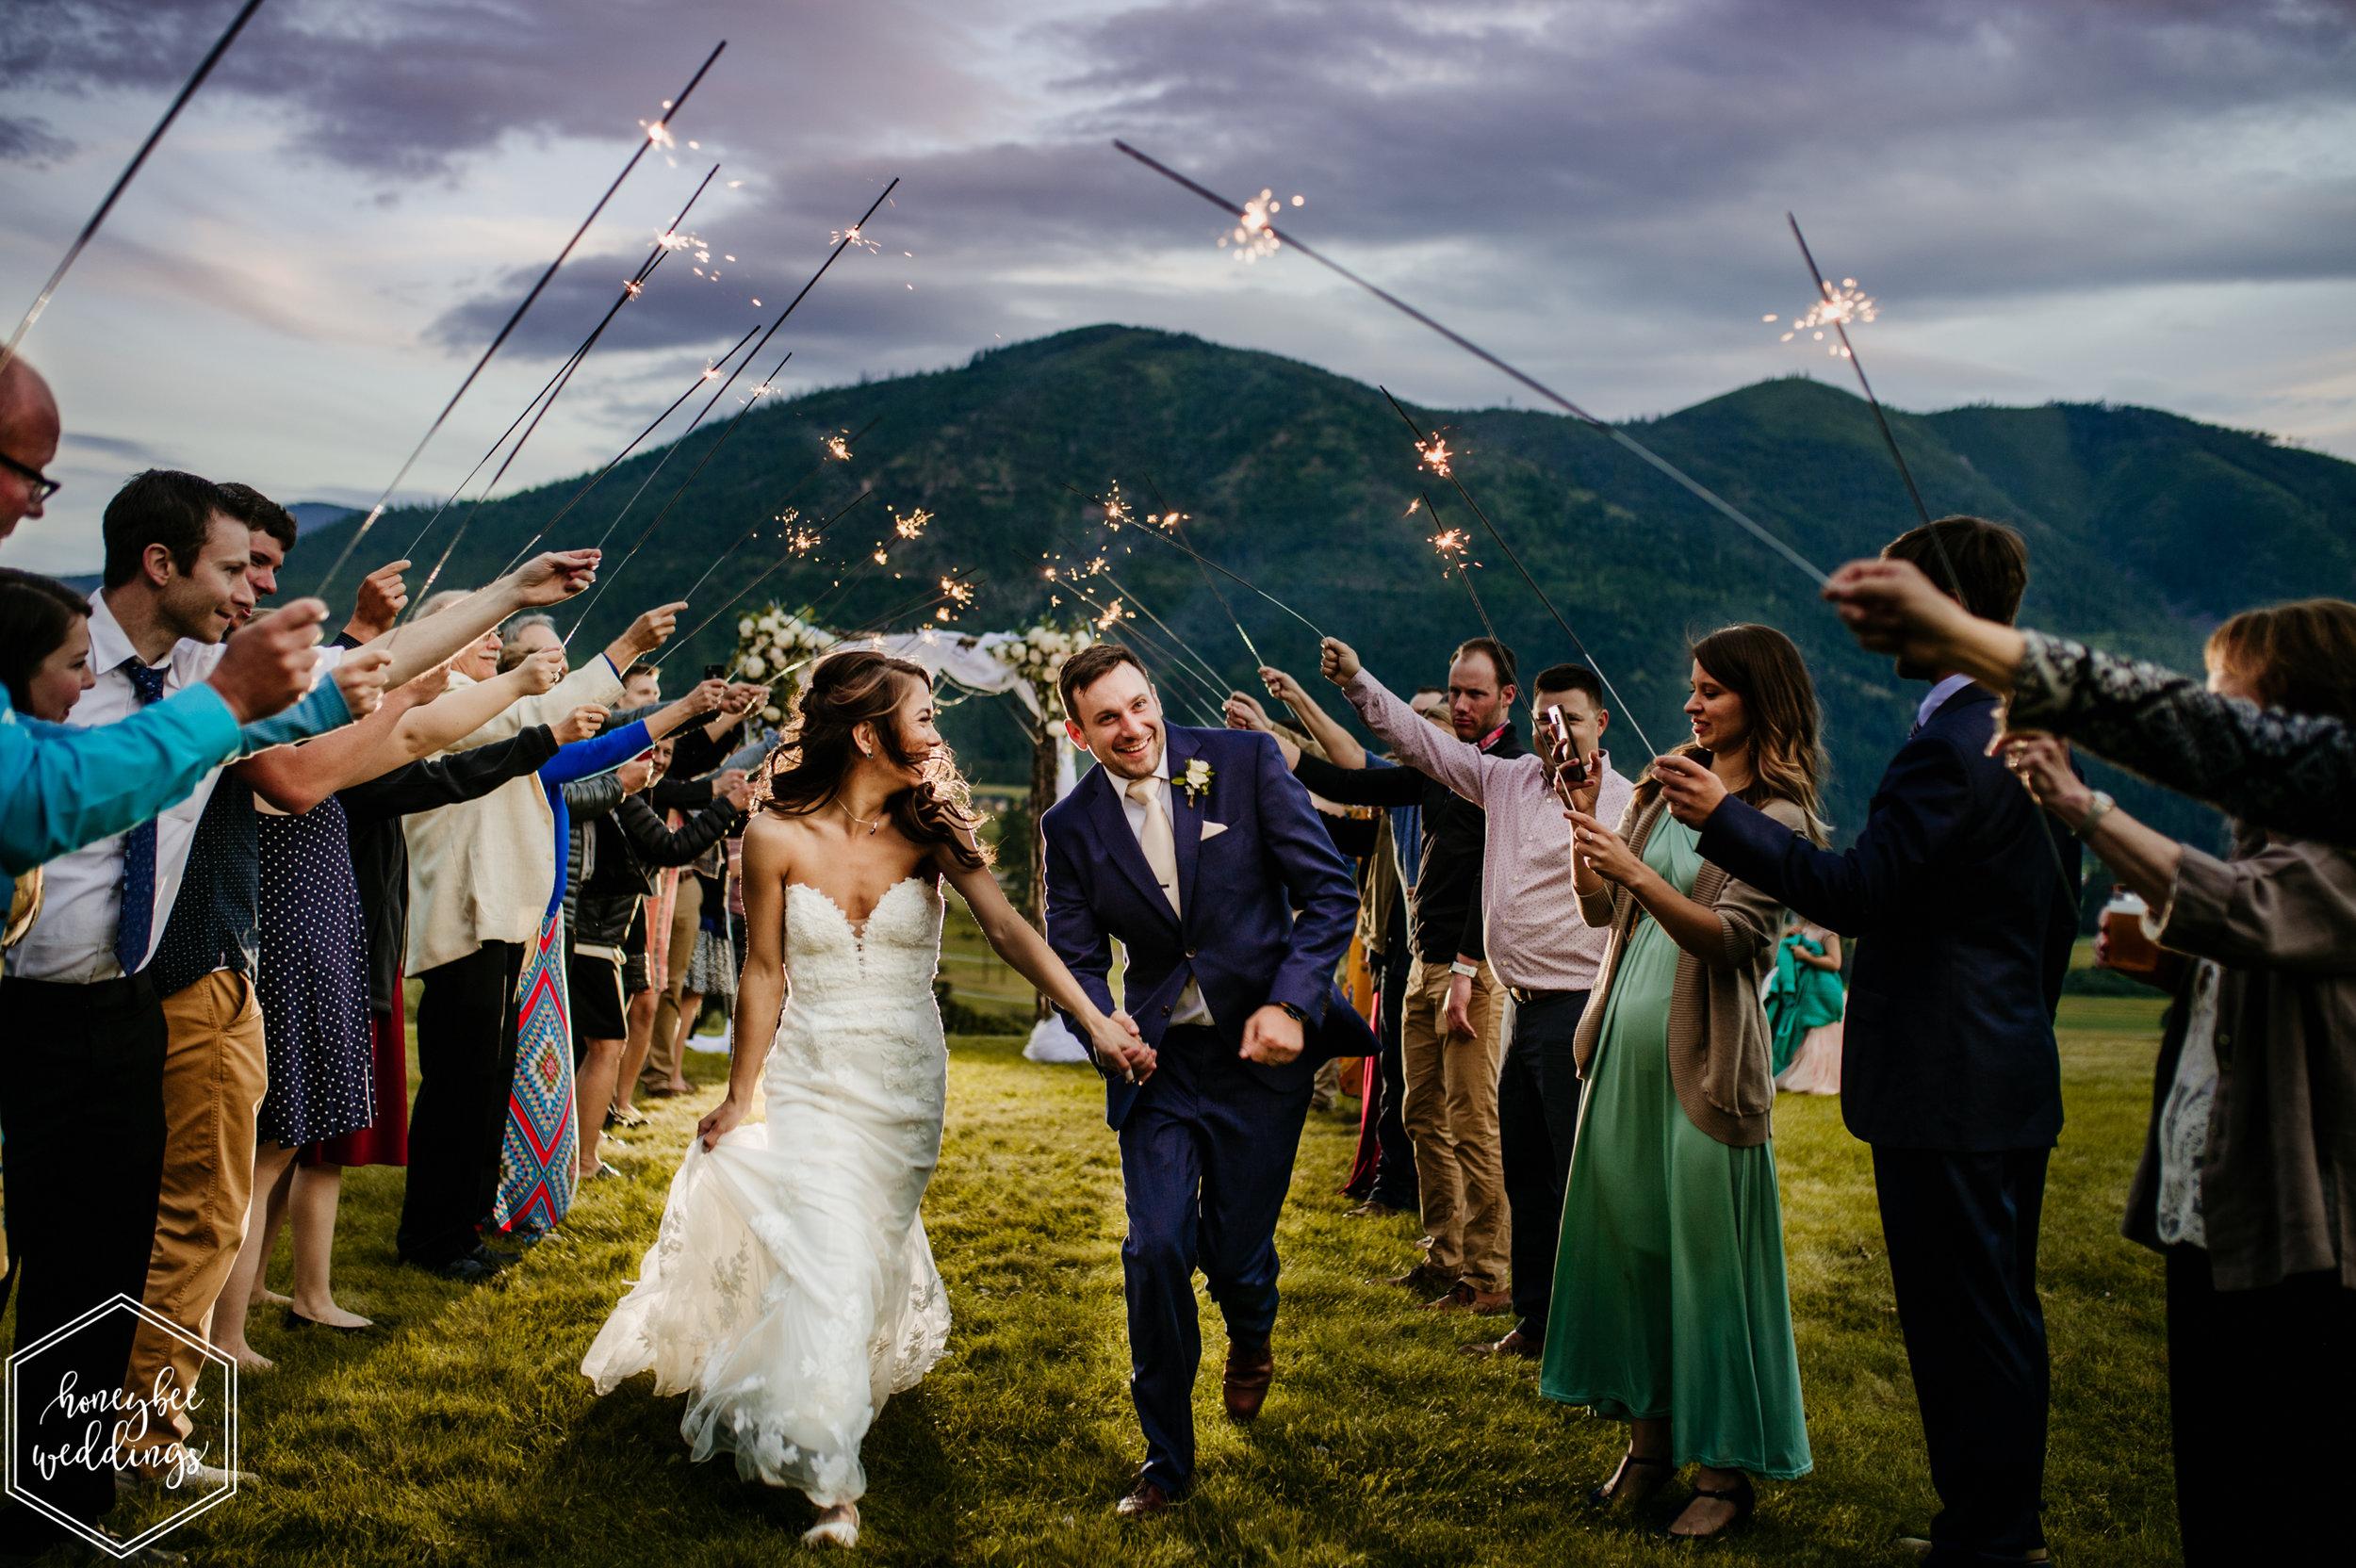 405Montana Wedding Photographer_Missoula Wedding_Honeybee Weddings_Devlin & Jacob_June 22, 2019-2535.jpg